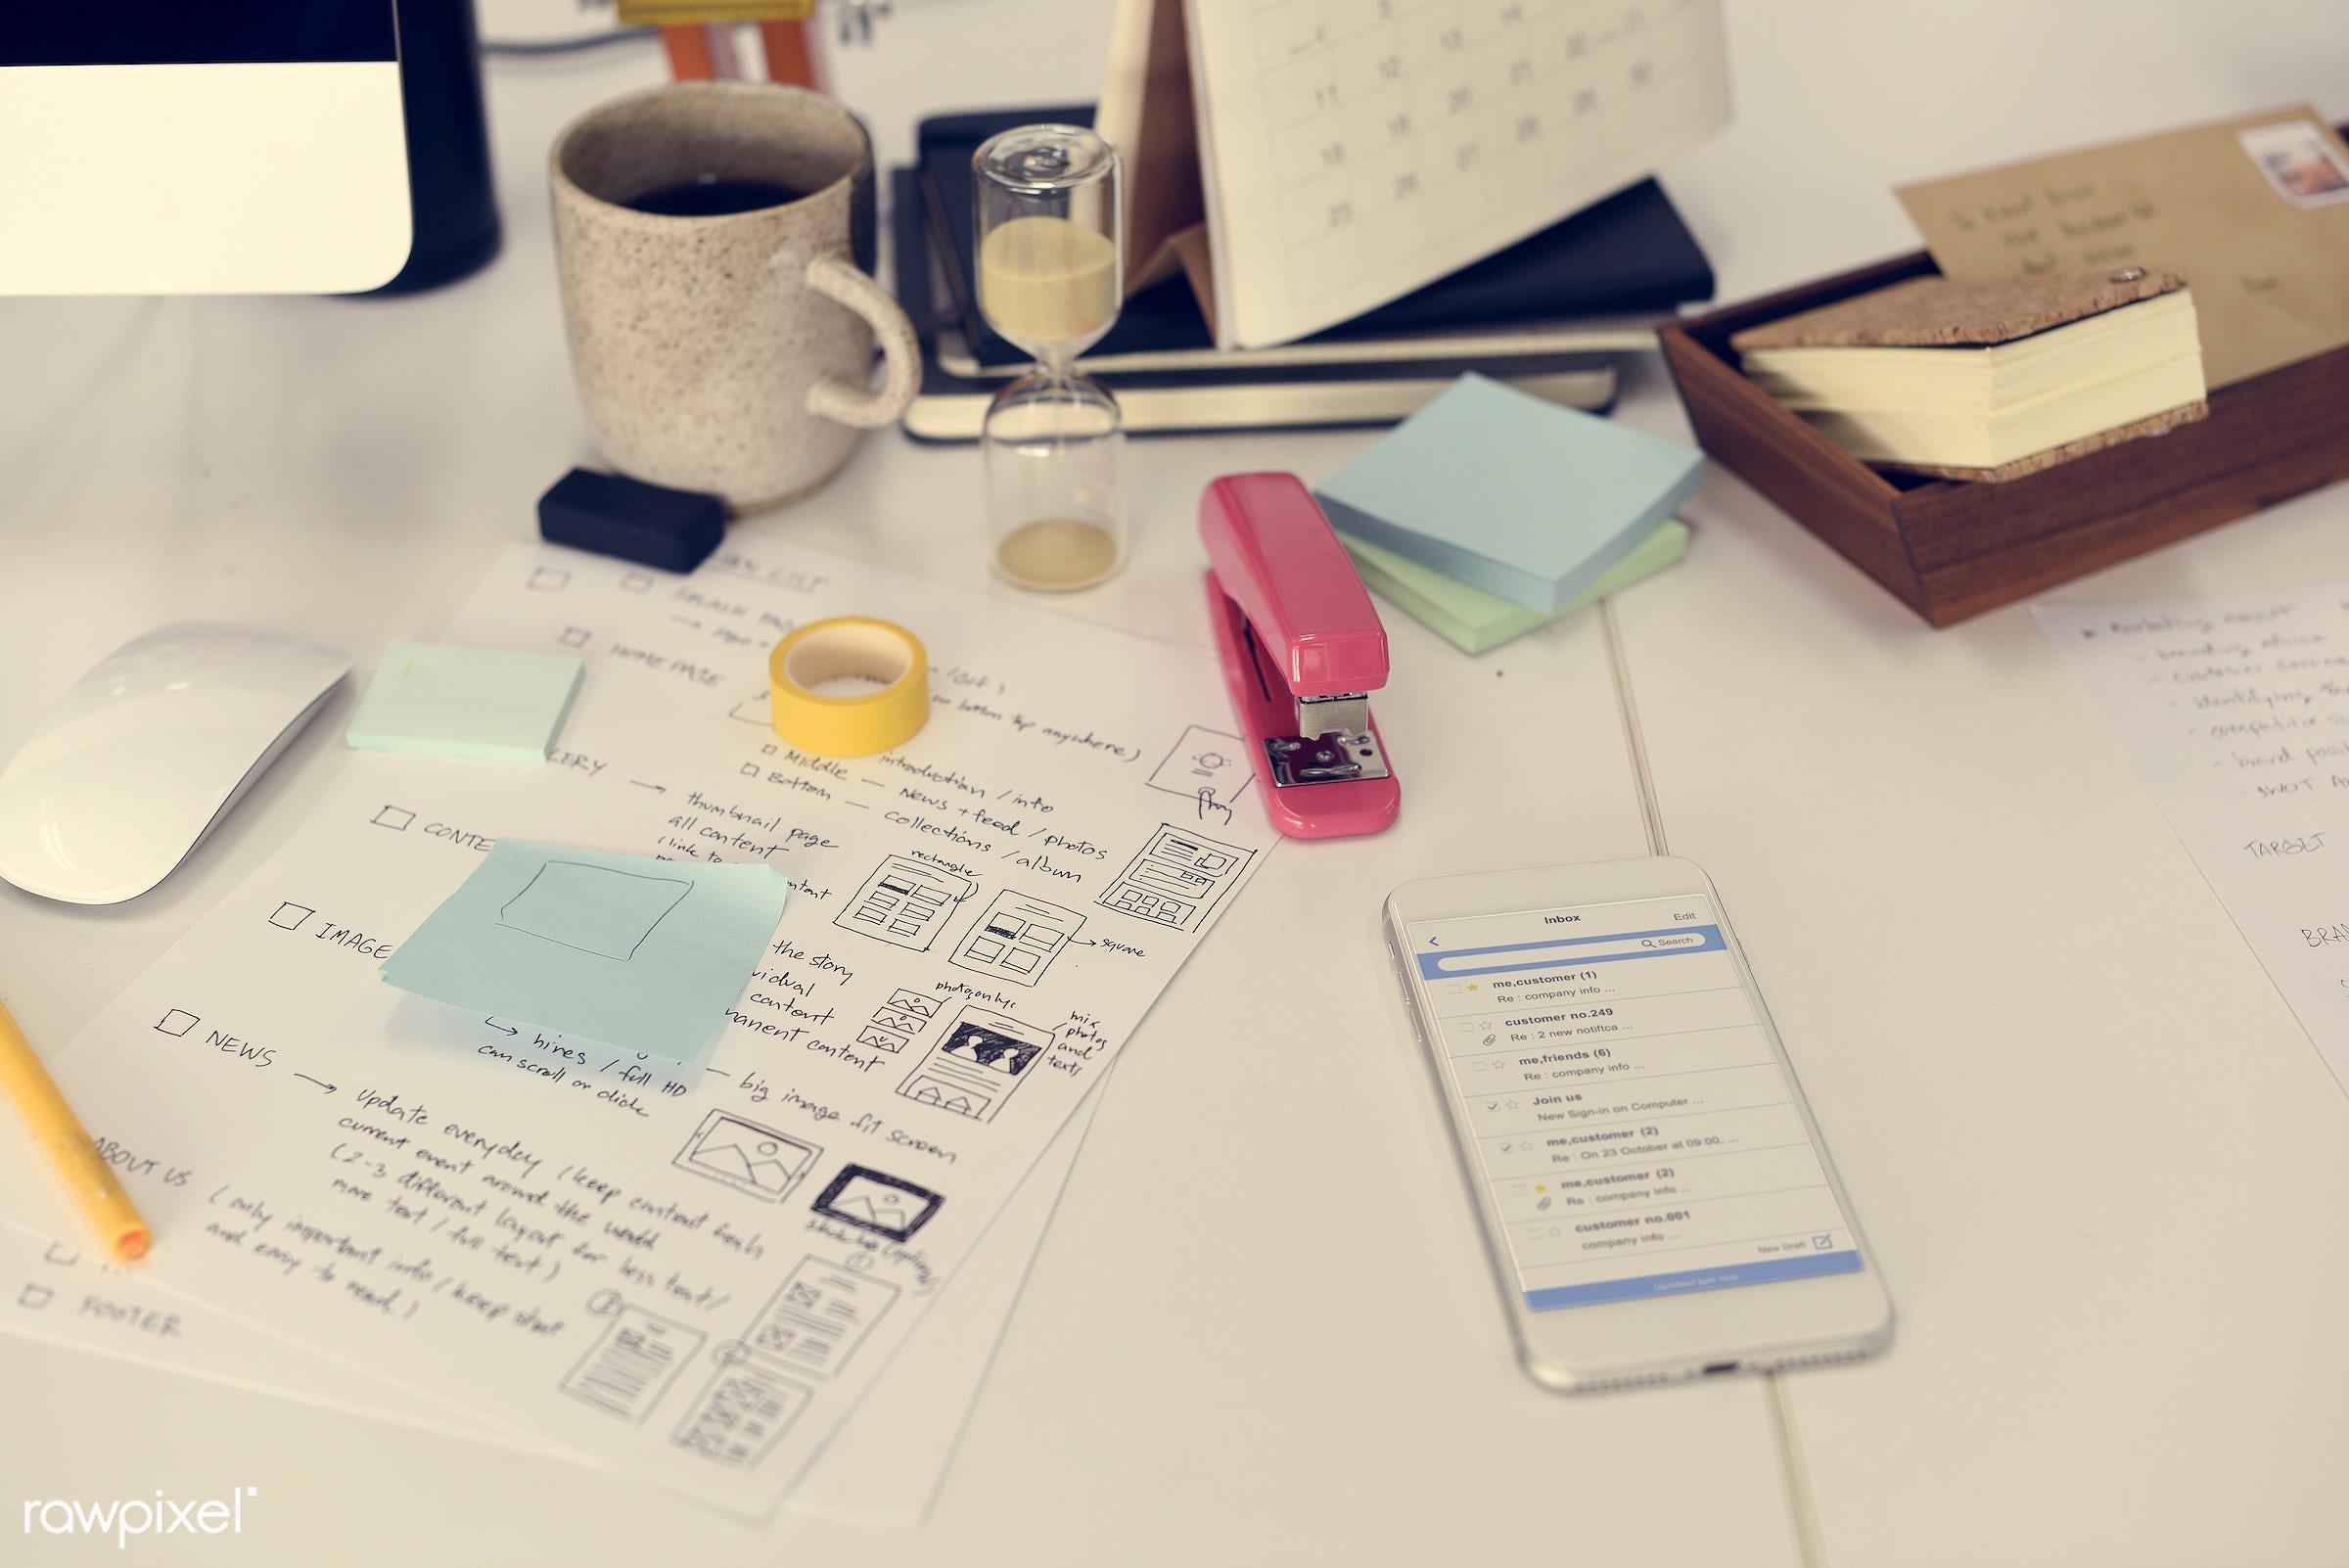 career, communication, company, connection, creative, design, development, digital, drawing, entrepreneur, ideas,...